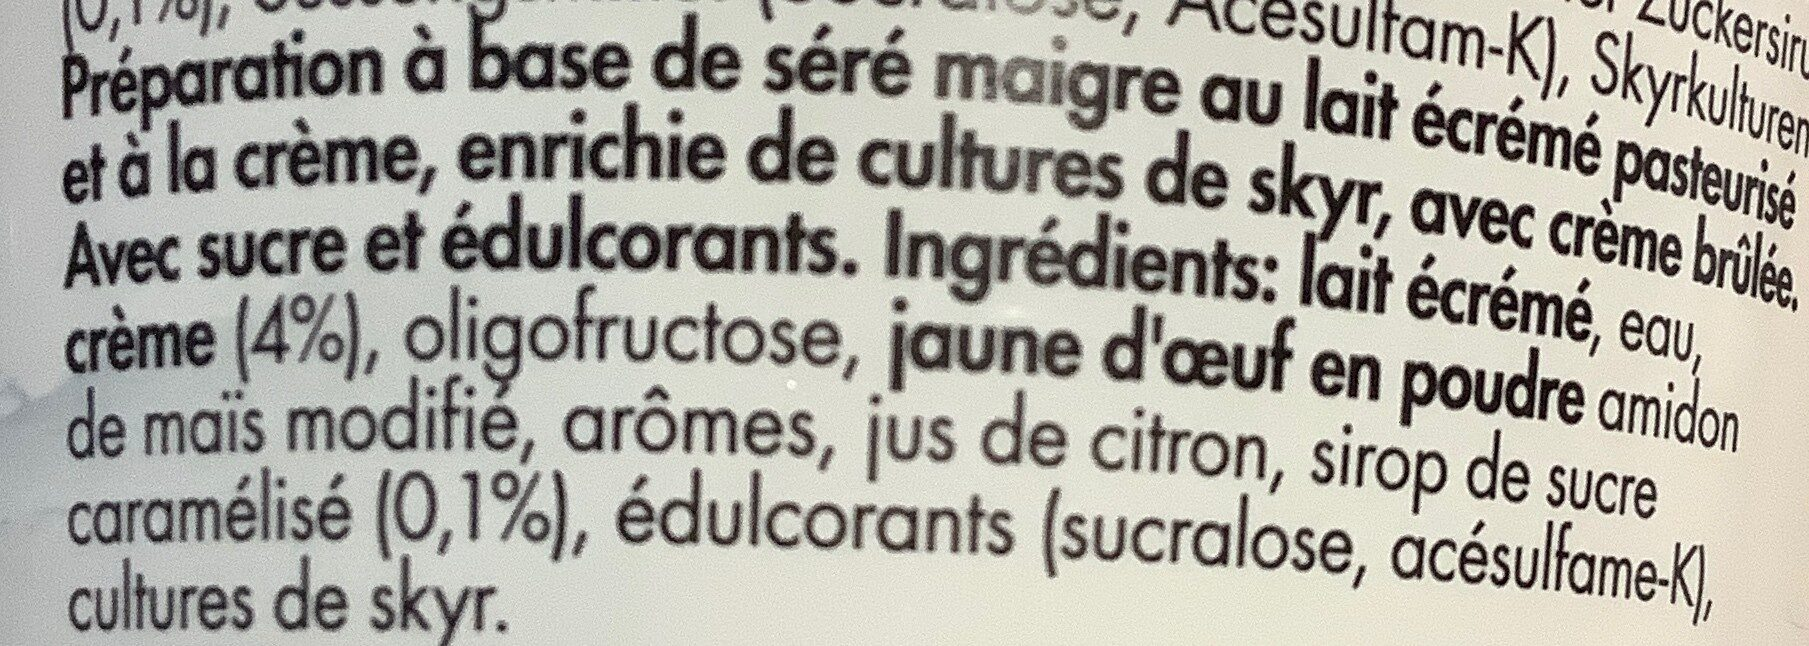 Skyr Crème brulée - Ingredienti - de